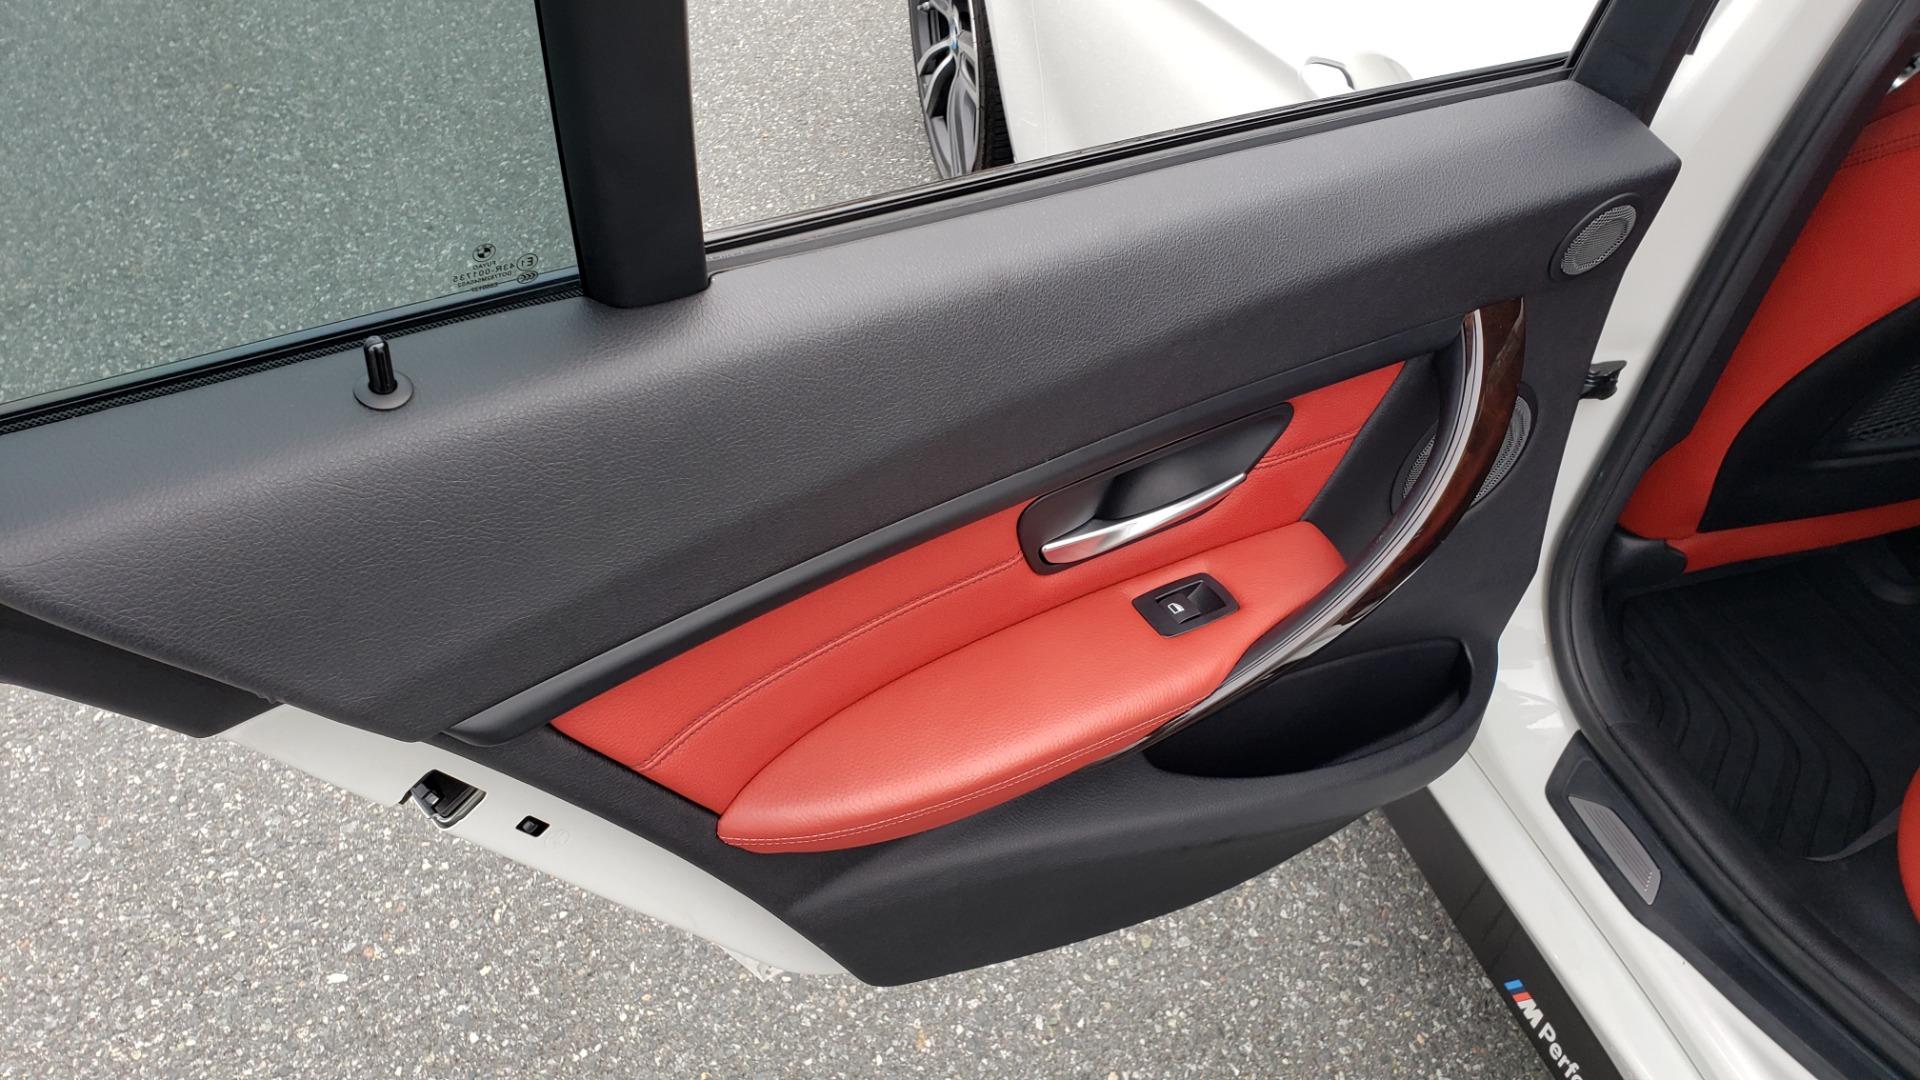 Used 2015 BMW 3 Series 335I M-SPORT / PREM PKG / HK SND / SUNROOF / REARVIEW for sale Sold at Formula Imports in Charlotte NC 28227 59